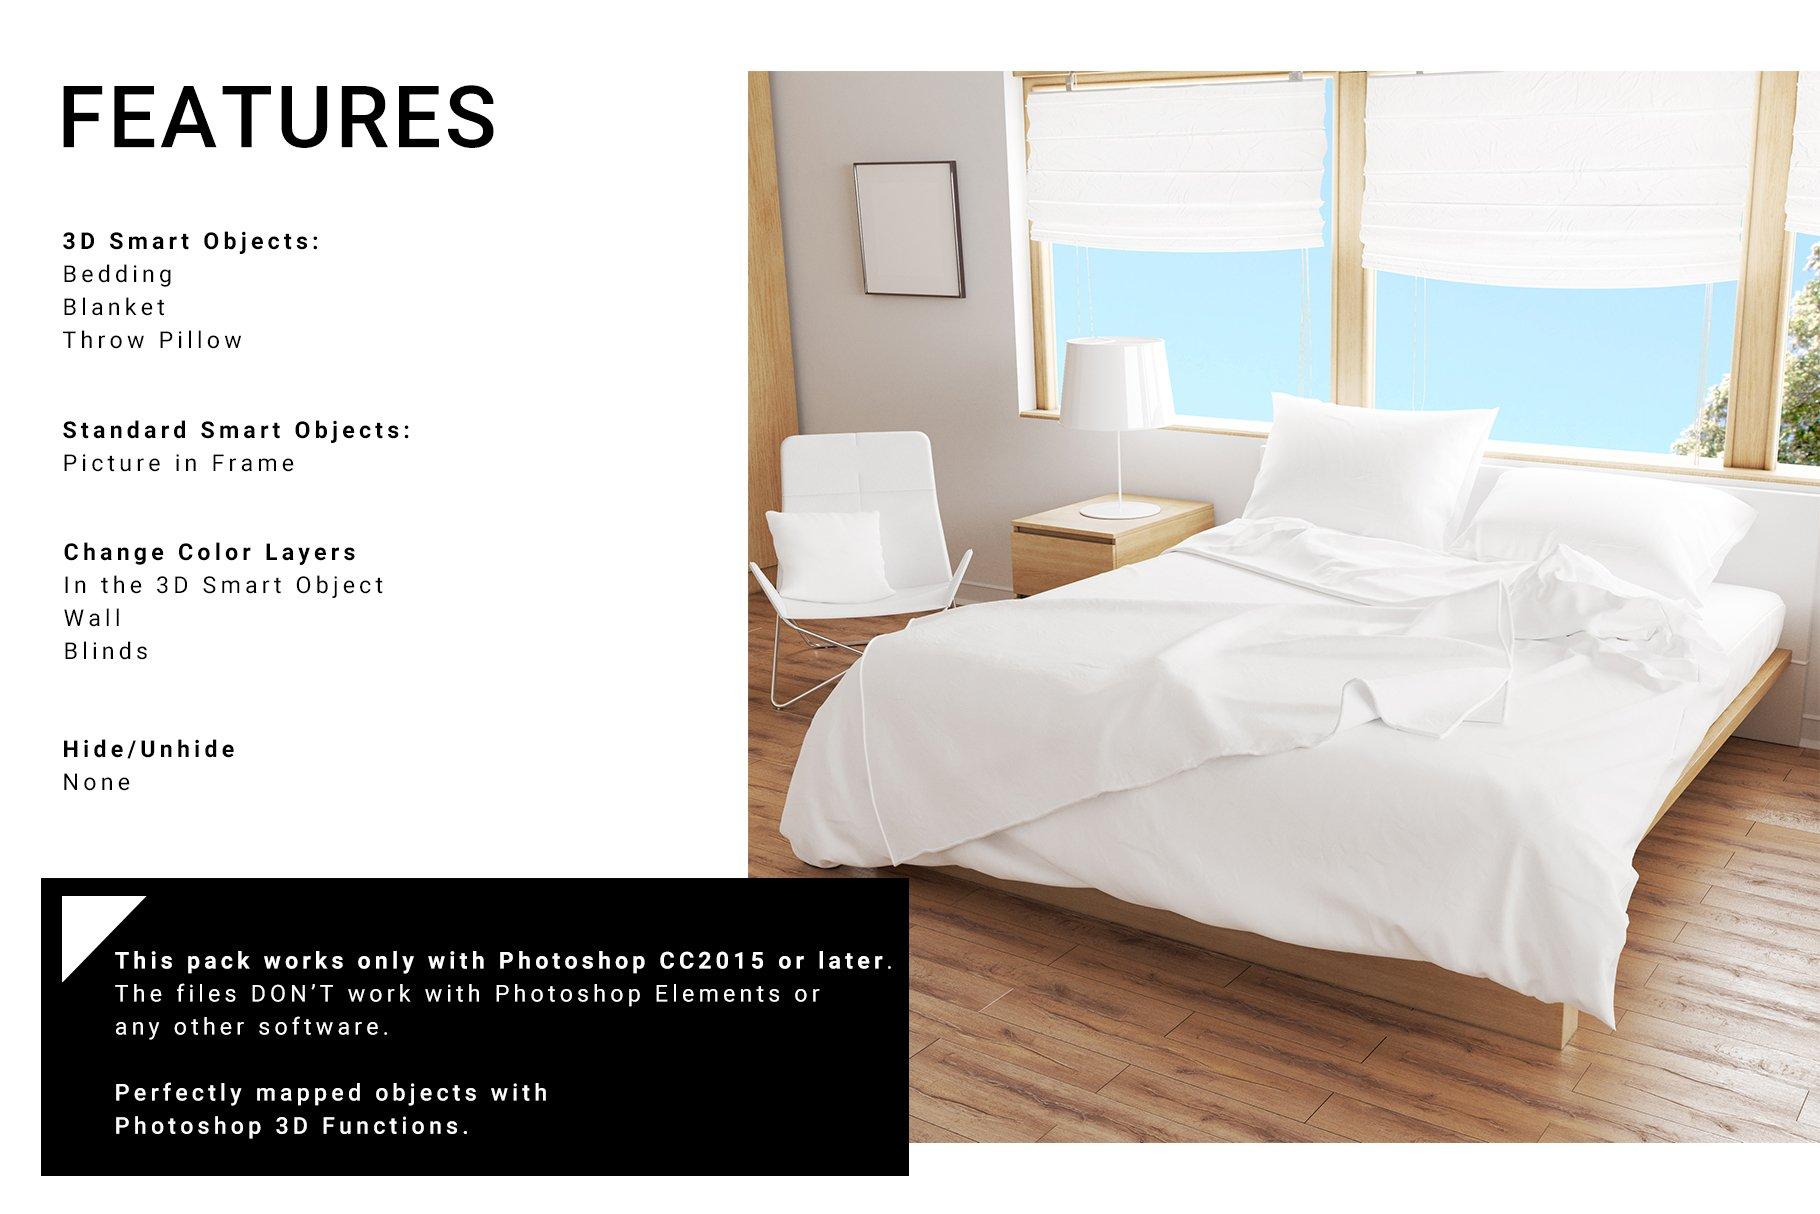 Bedroom Set - Bedding & Throw Pillow example image 5